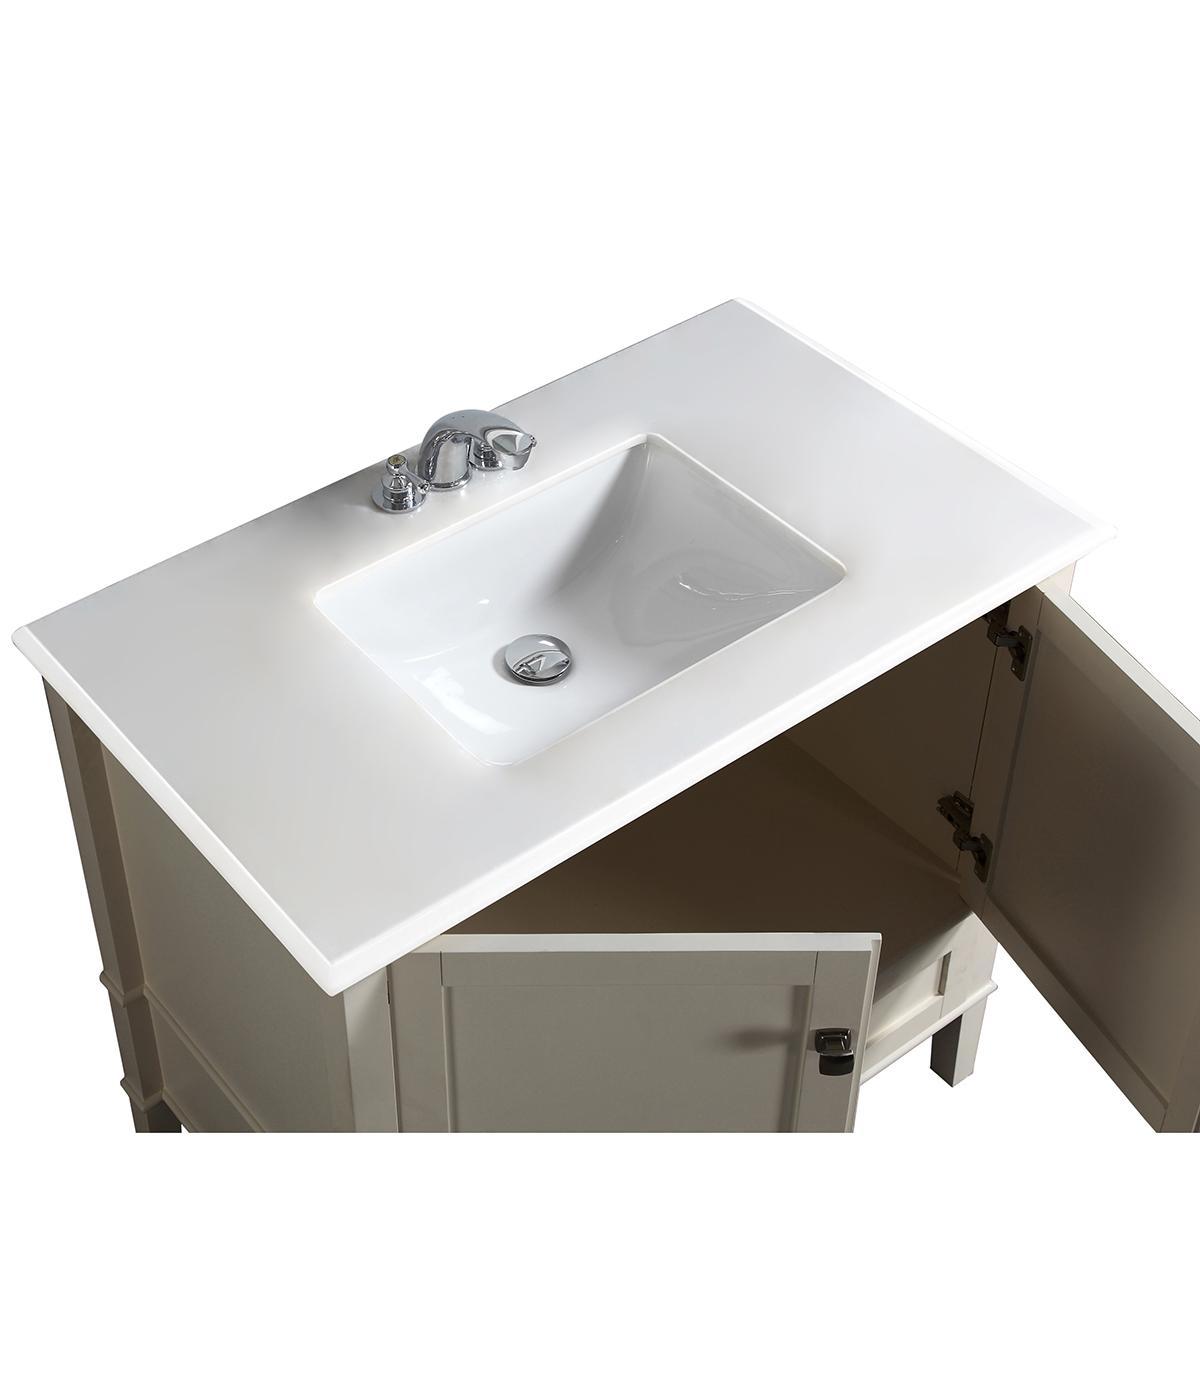 Bathroom Sink Smells Rotten Eggs